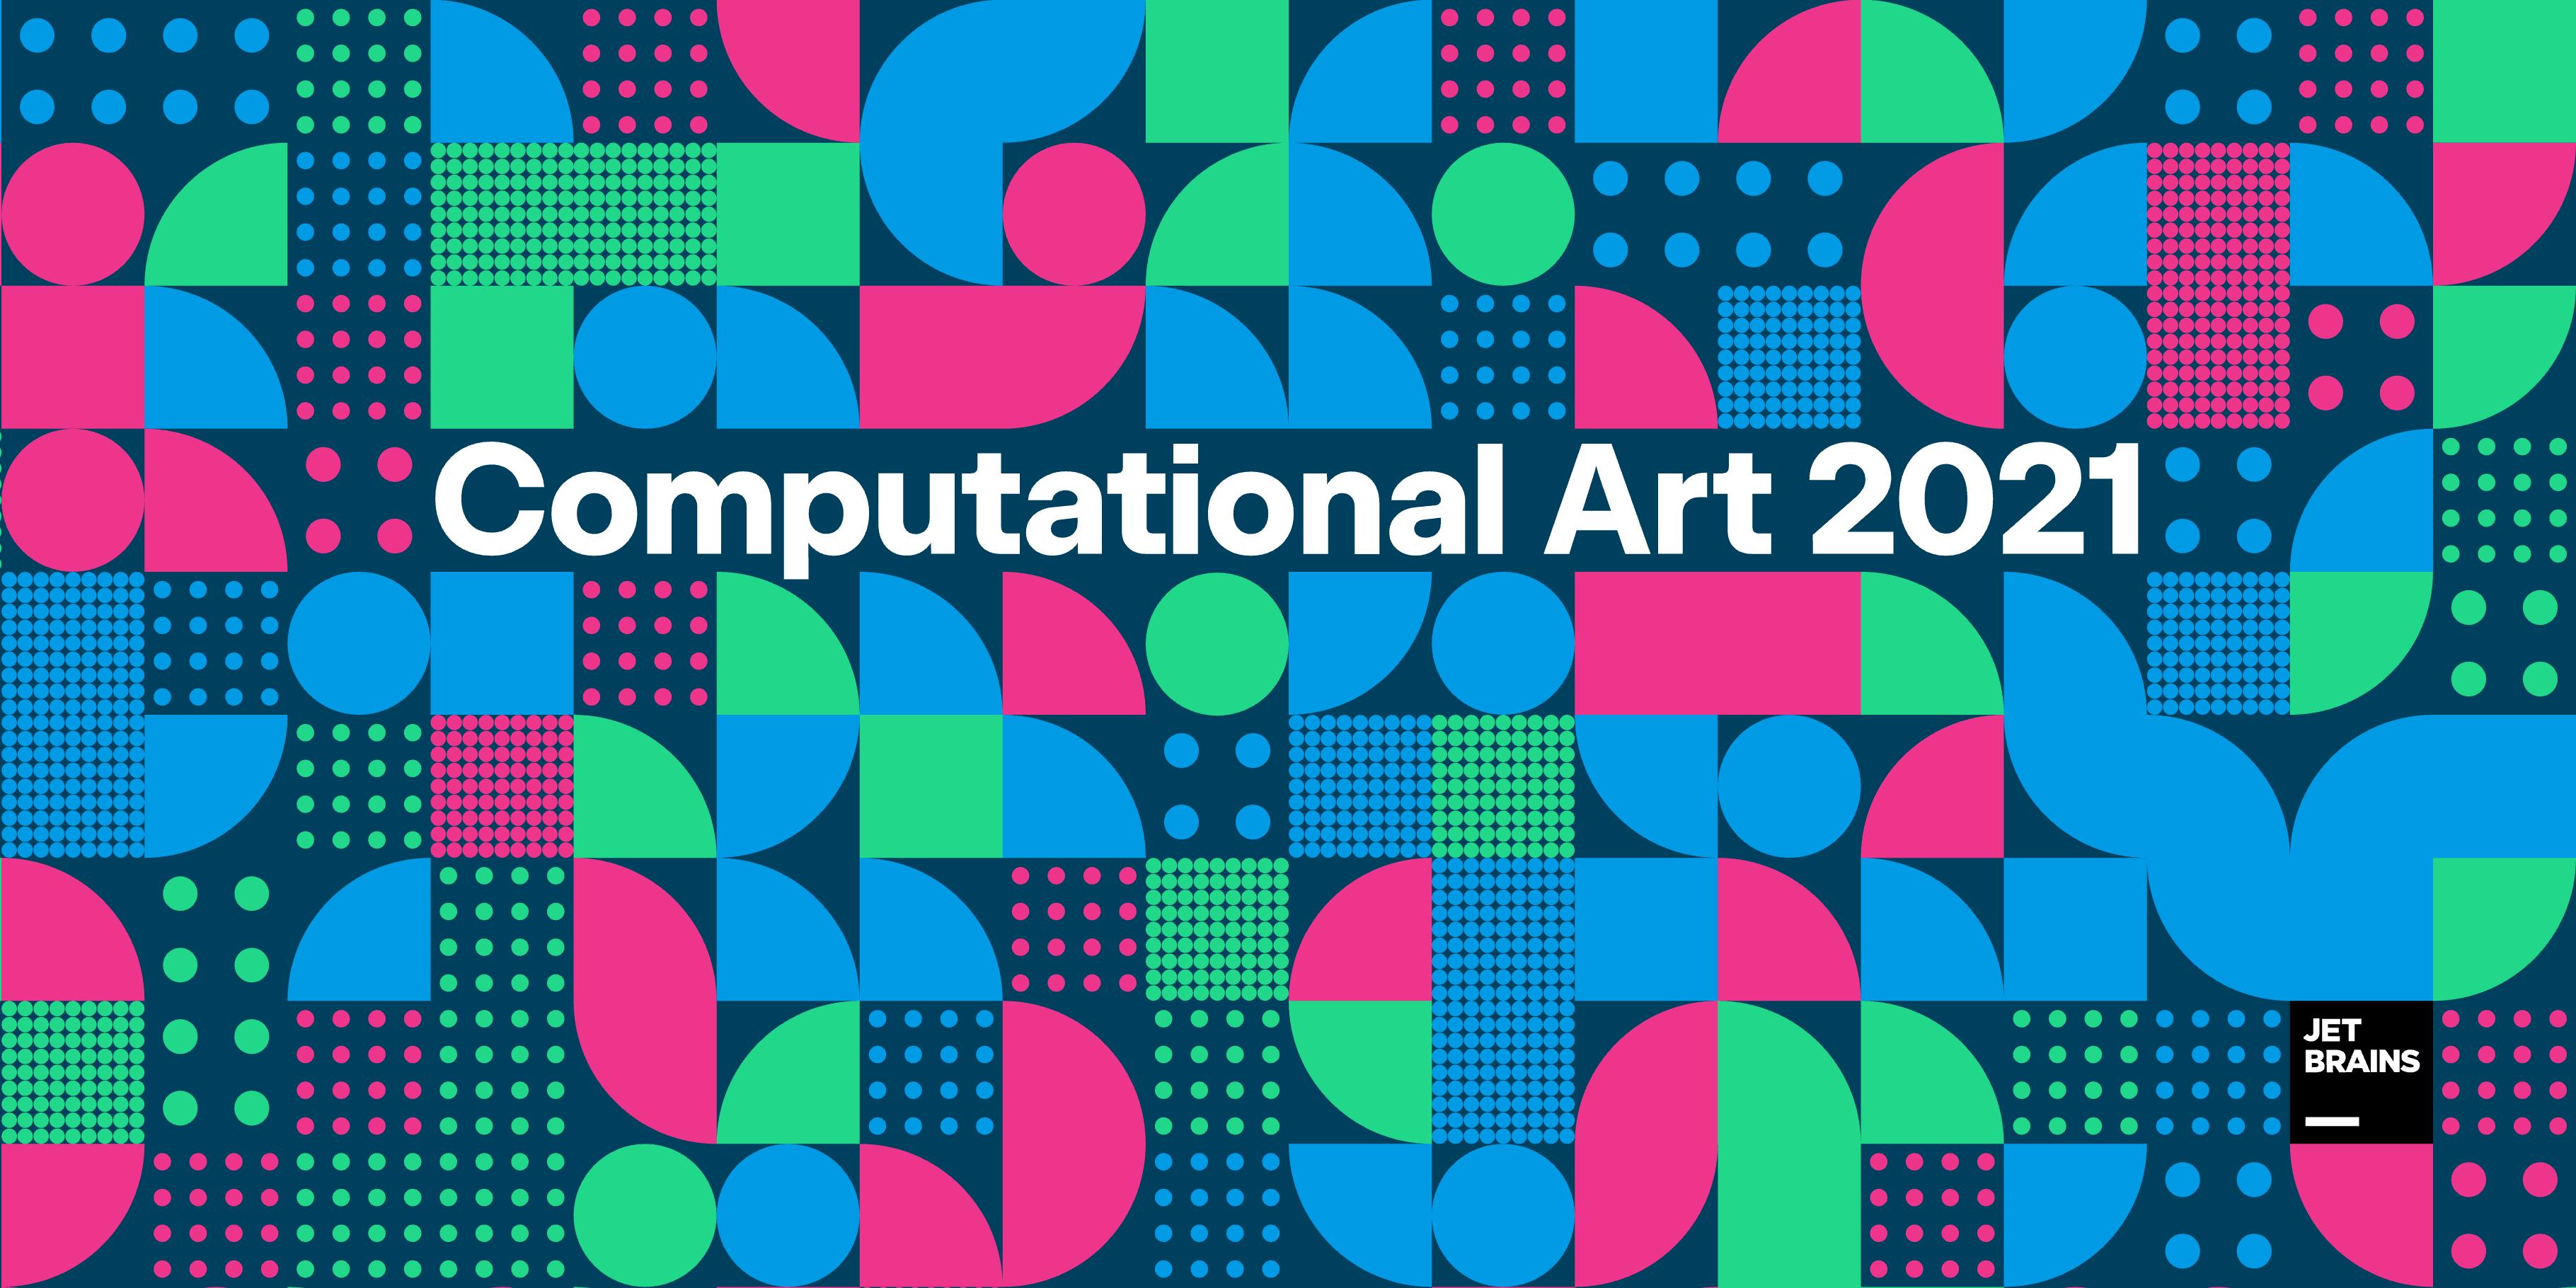 Computational Arts 2021